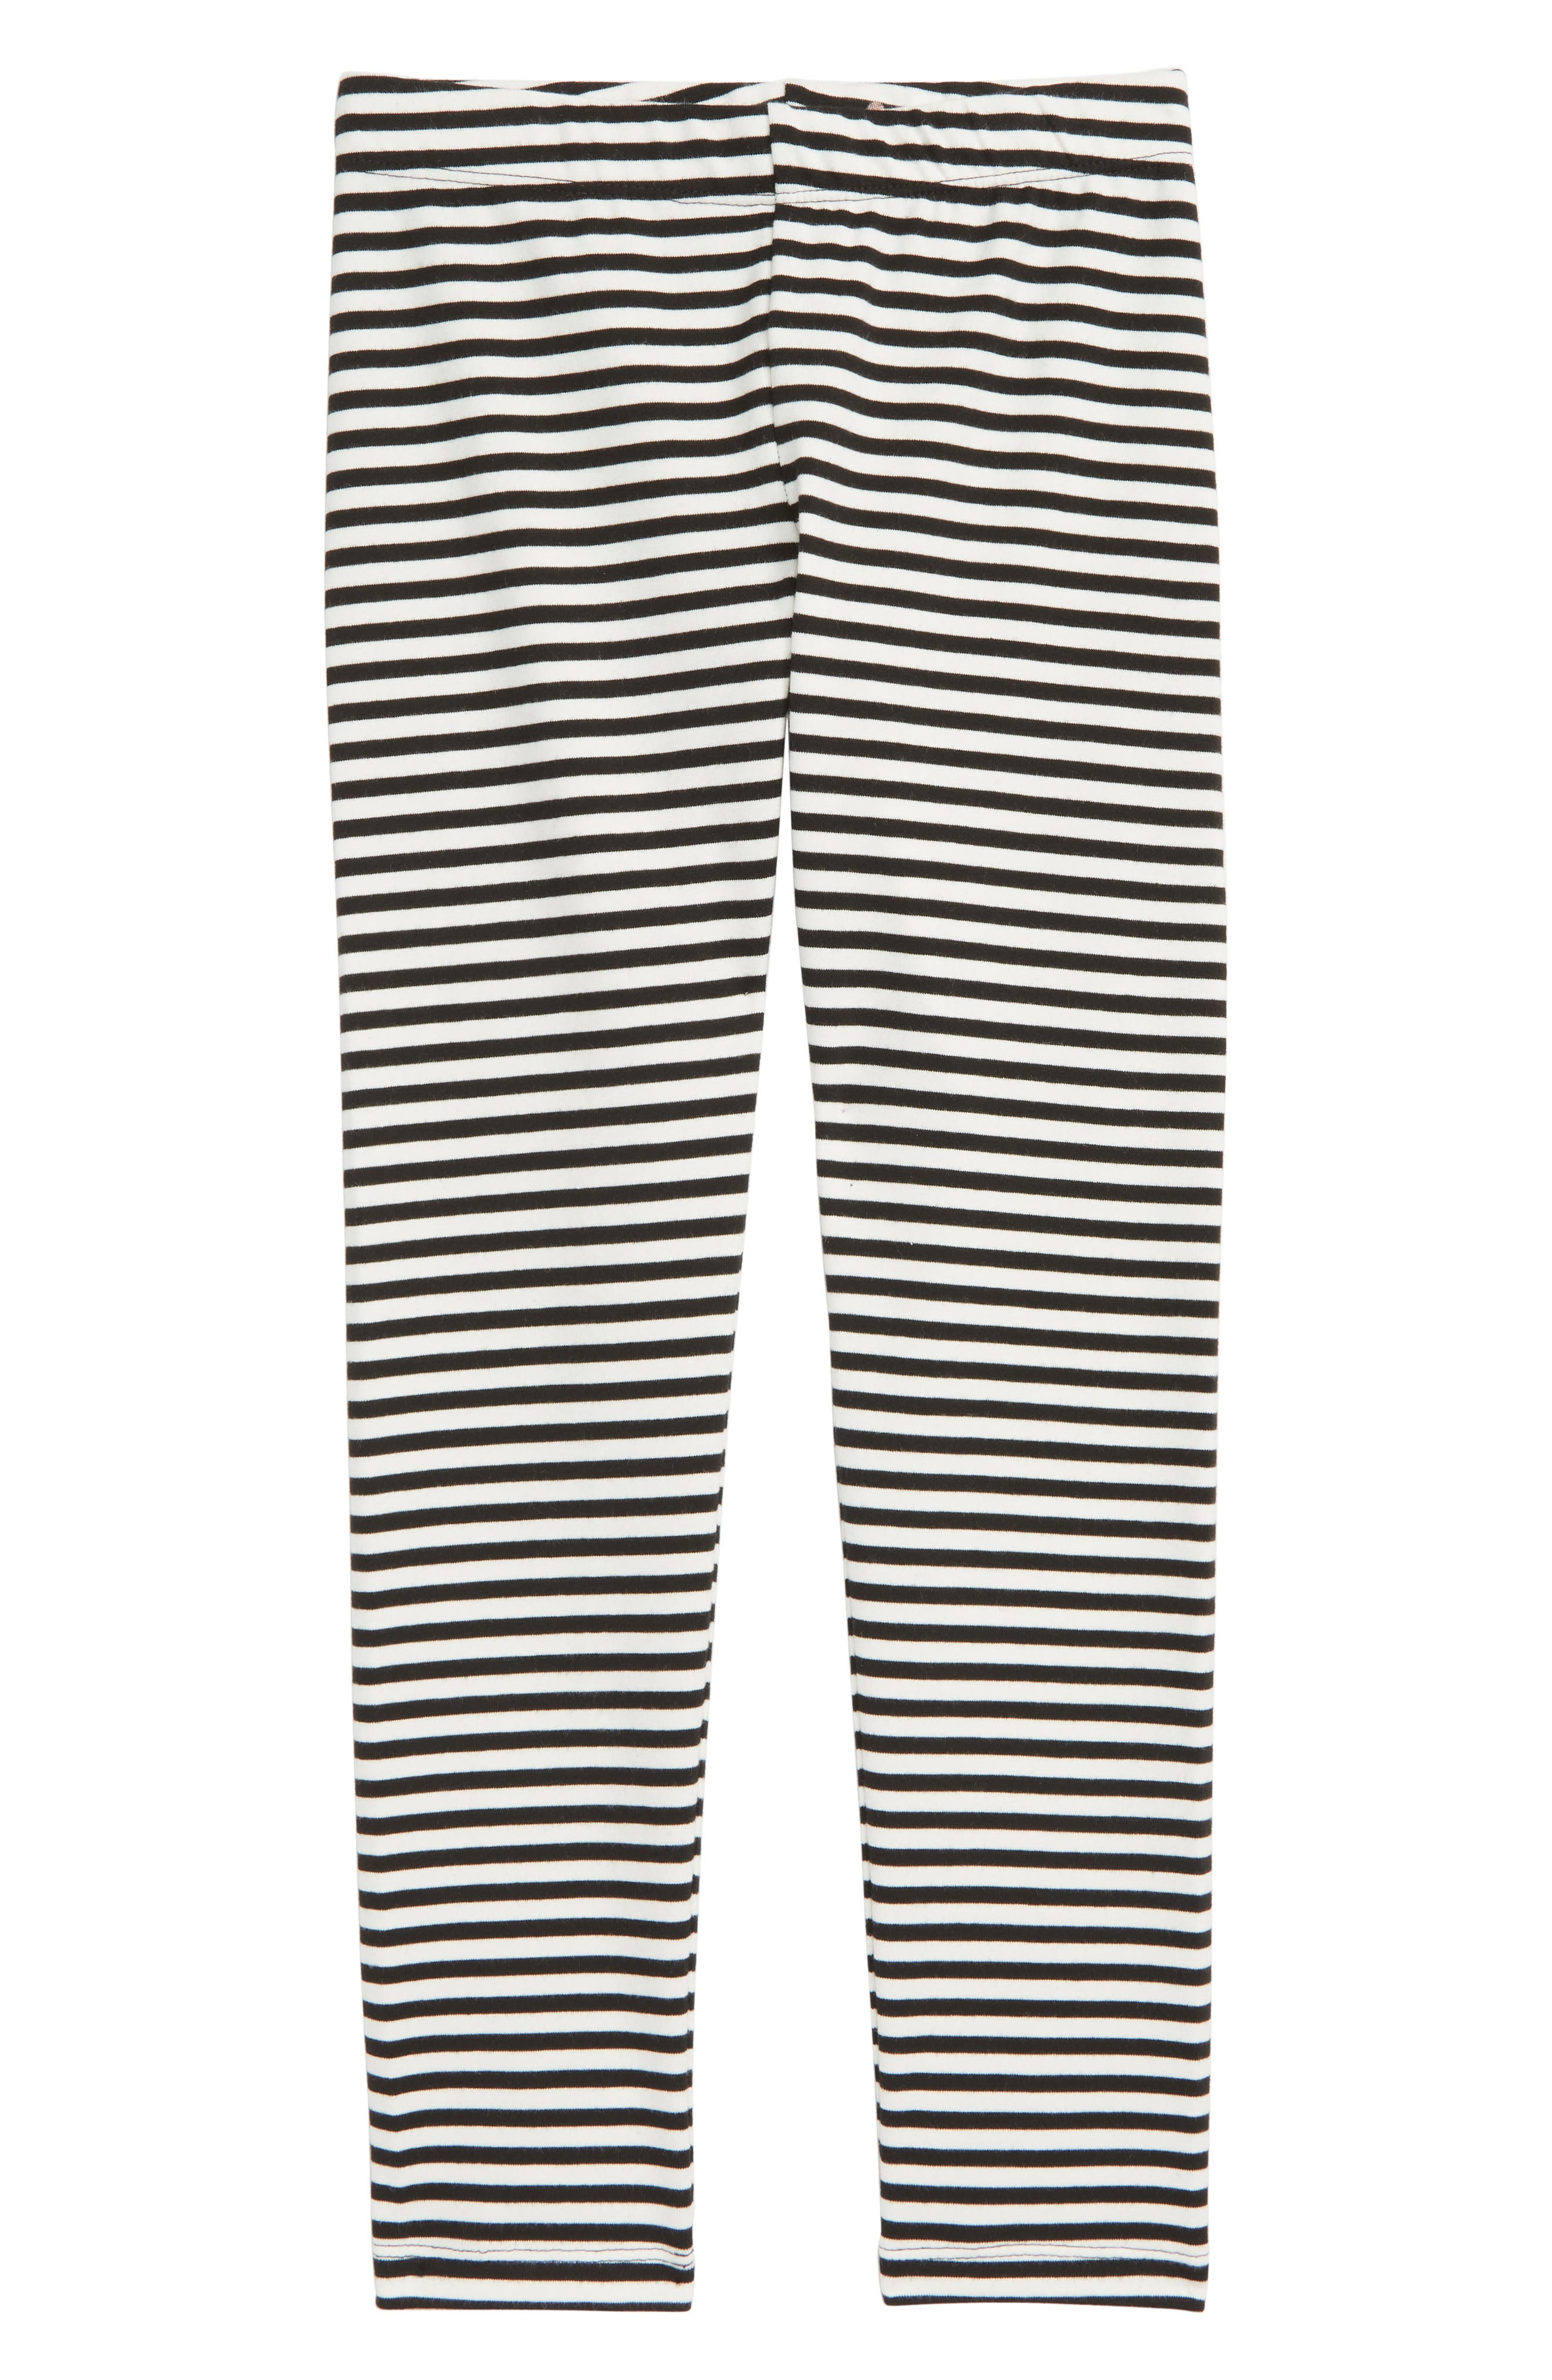 Stripe Leggings,                             Main thumbnail 1, color,                             BLACK AND WHITE STRIPE